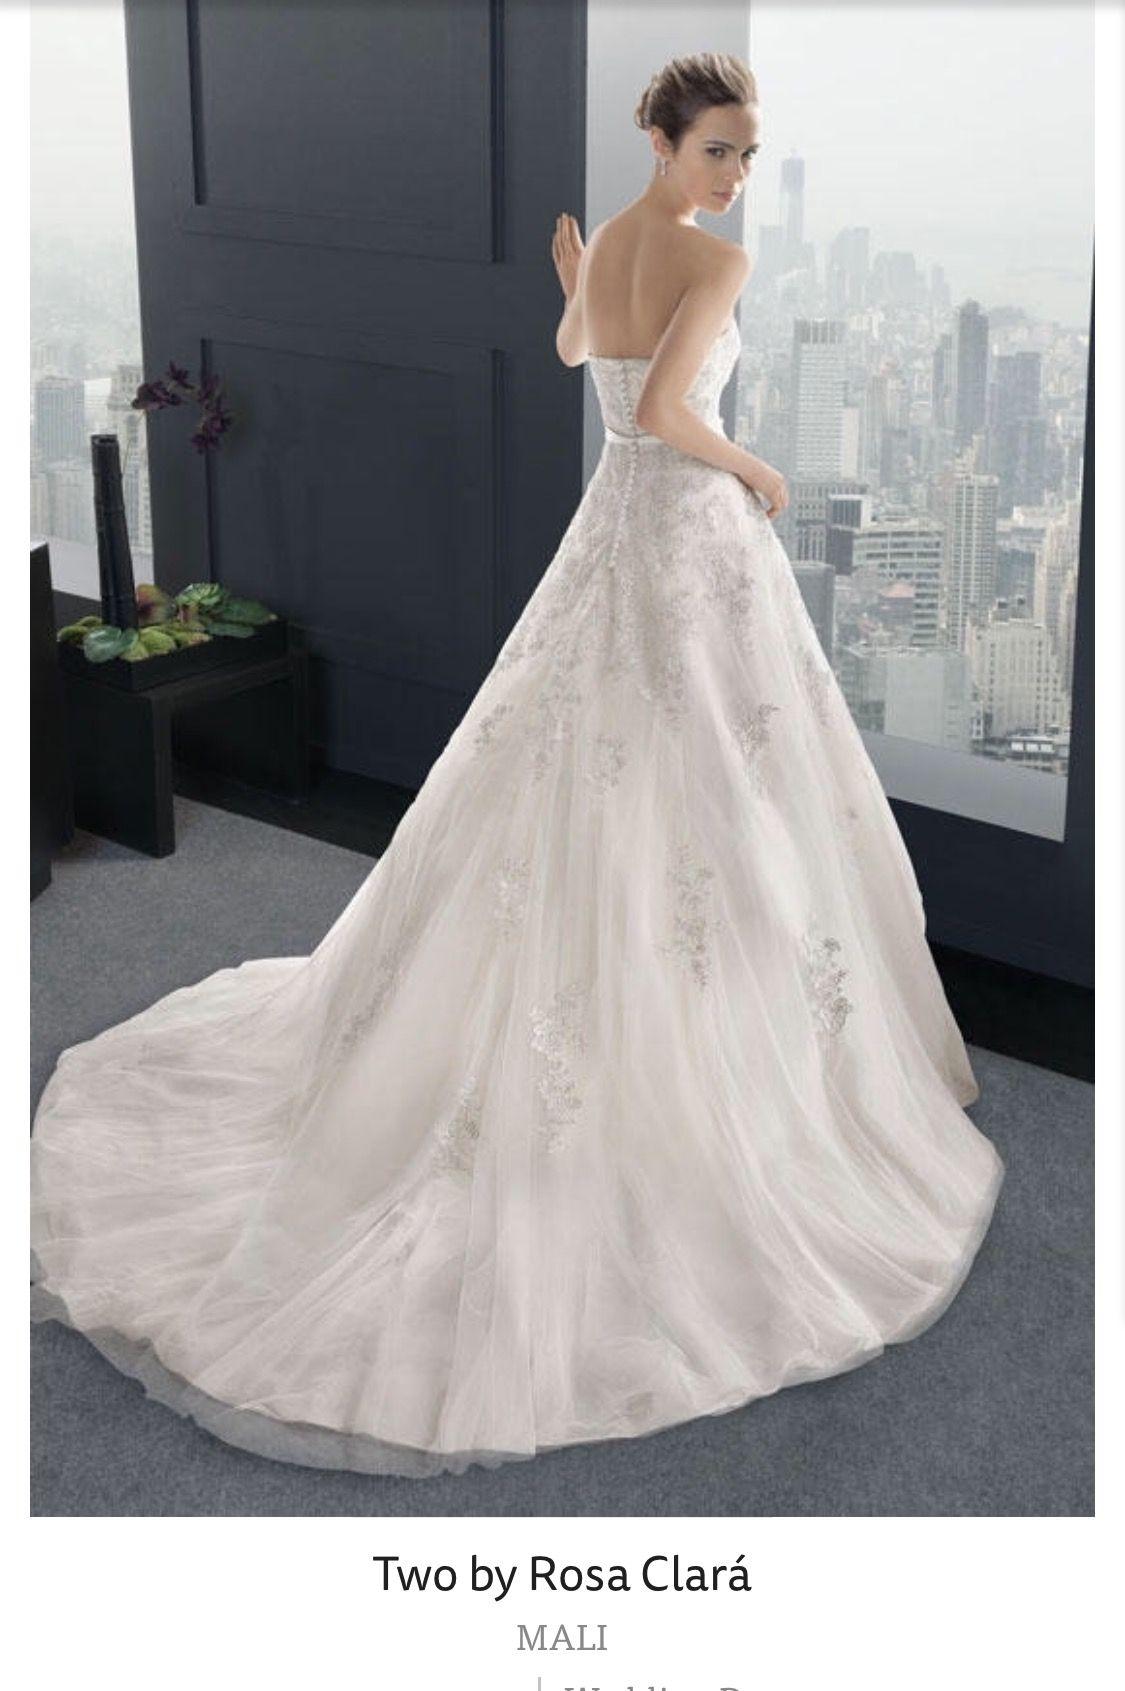 Pin di Michelle Alexander LeBlanc su Weddings  ff4a4c3d395